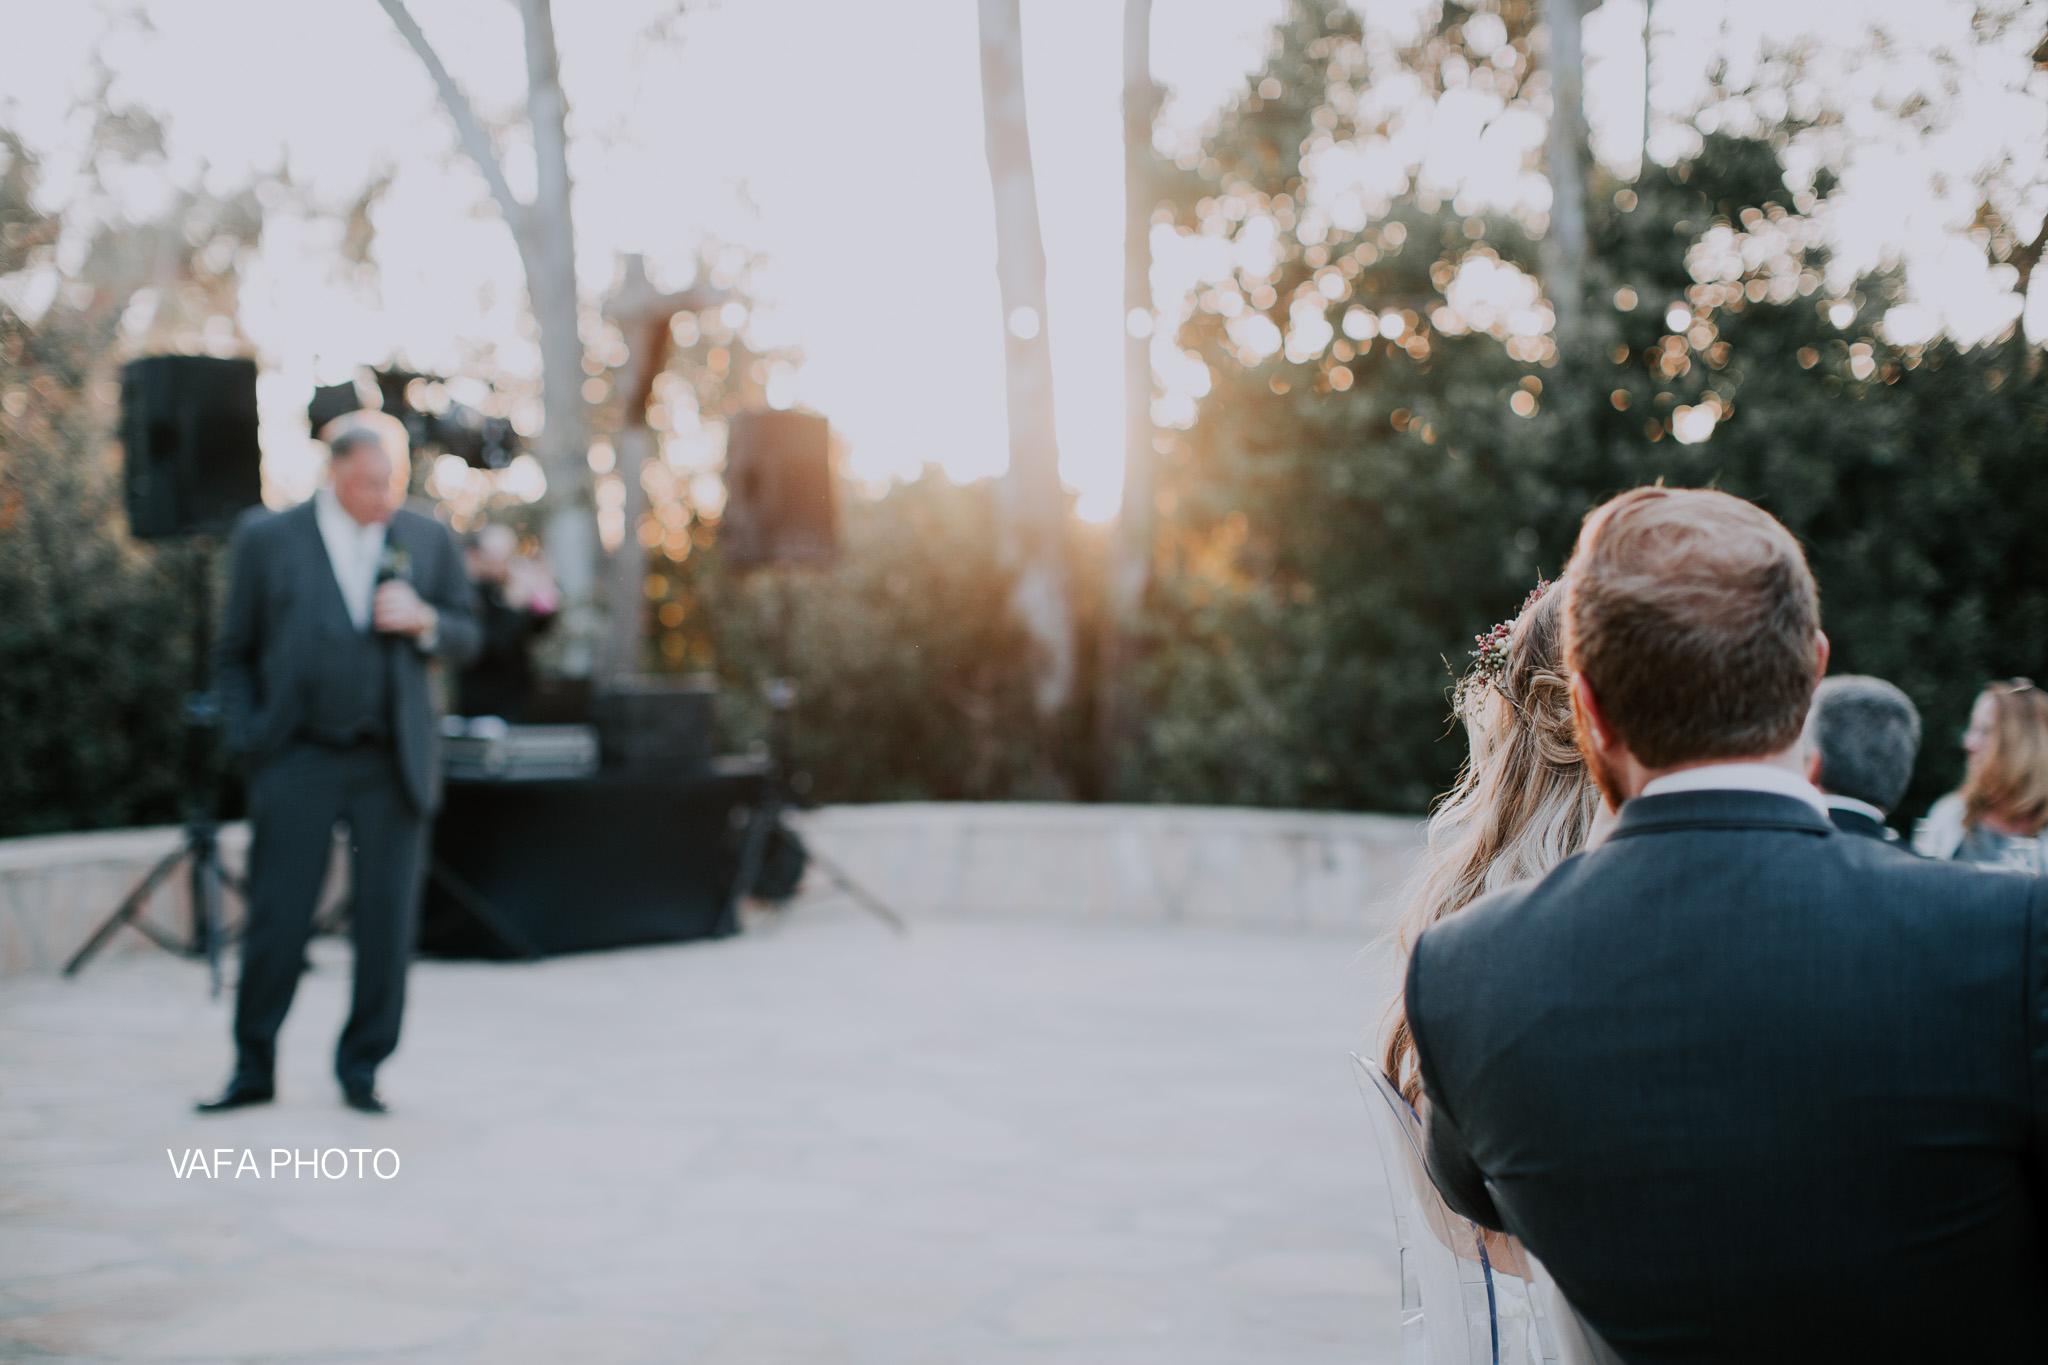 Leo-Carrillo-Ranch-Wedding-Lauren-Mike-Vafa-Photo-1017.jpg